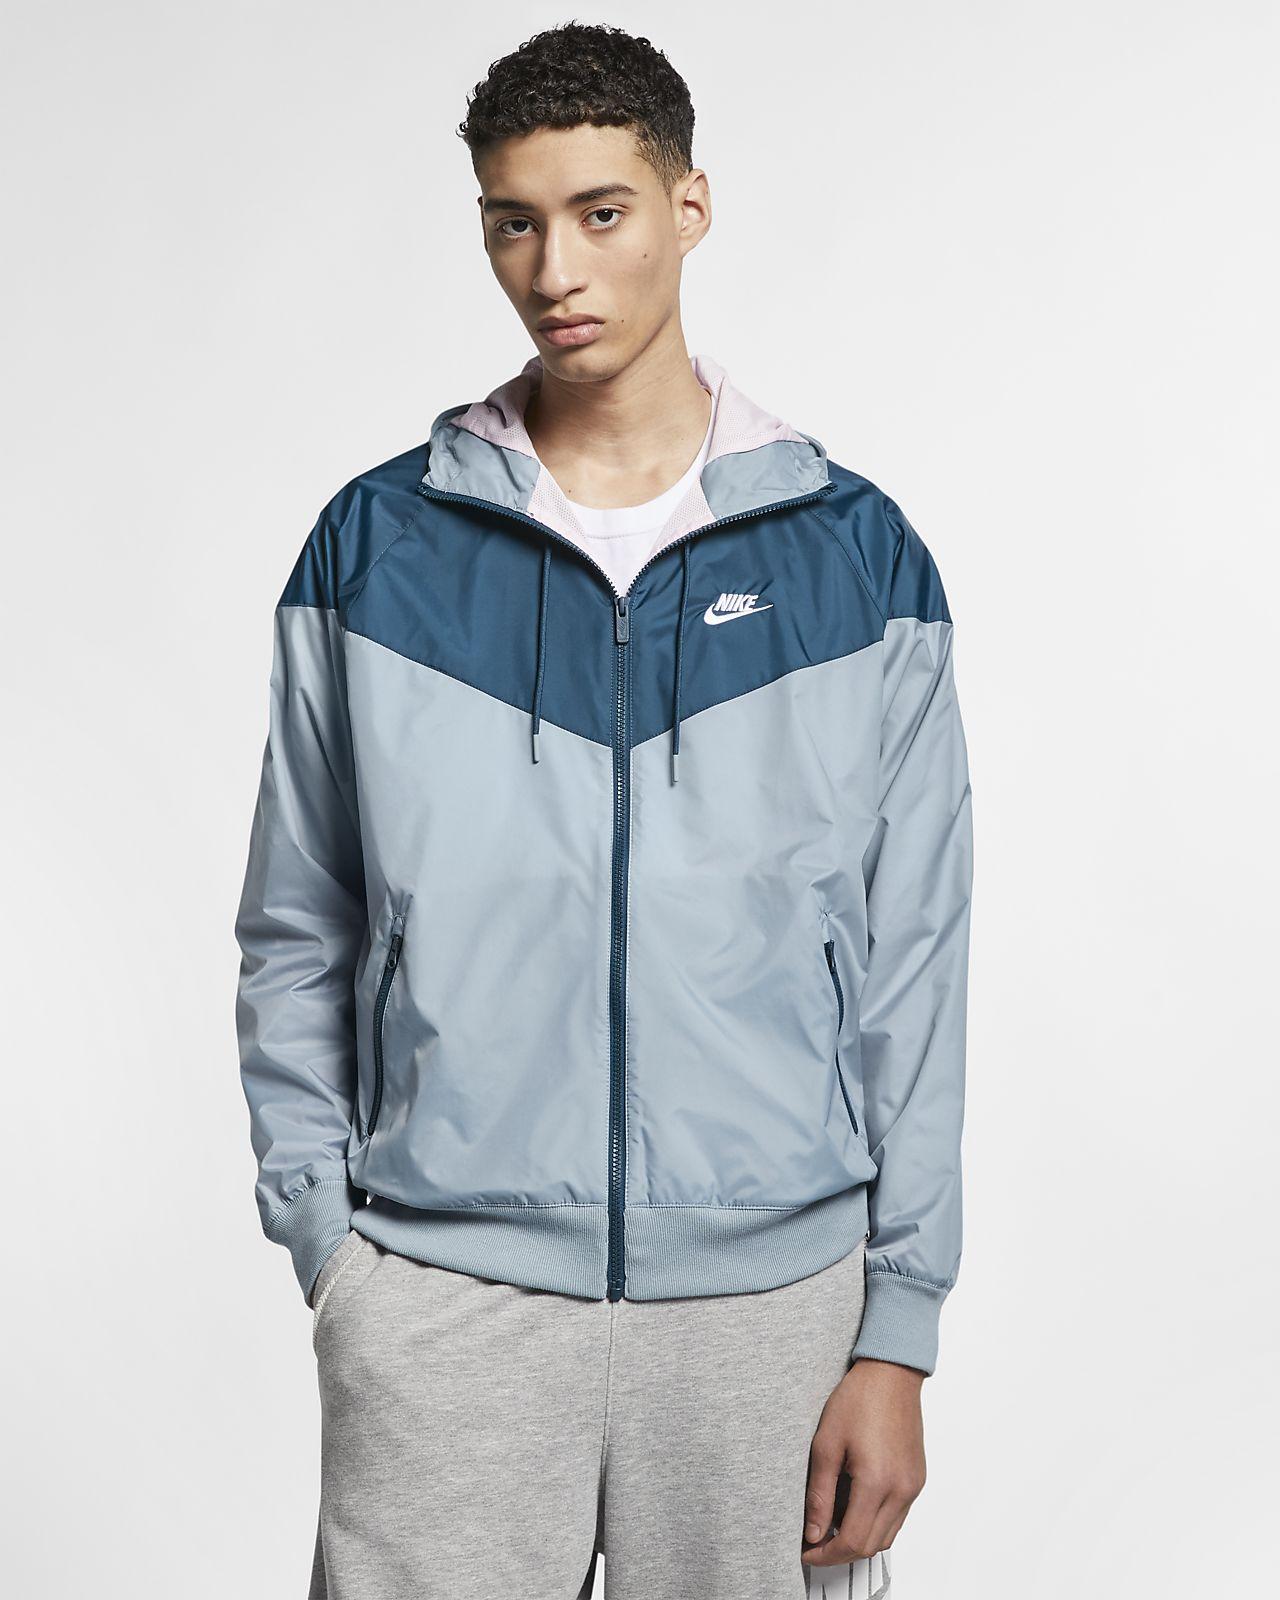 Nike Sportswear Windrunner Cortavientos con capucha - Hombre